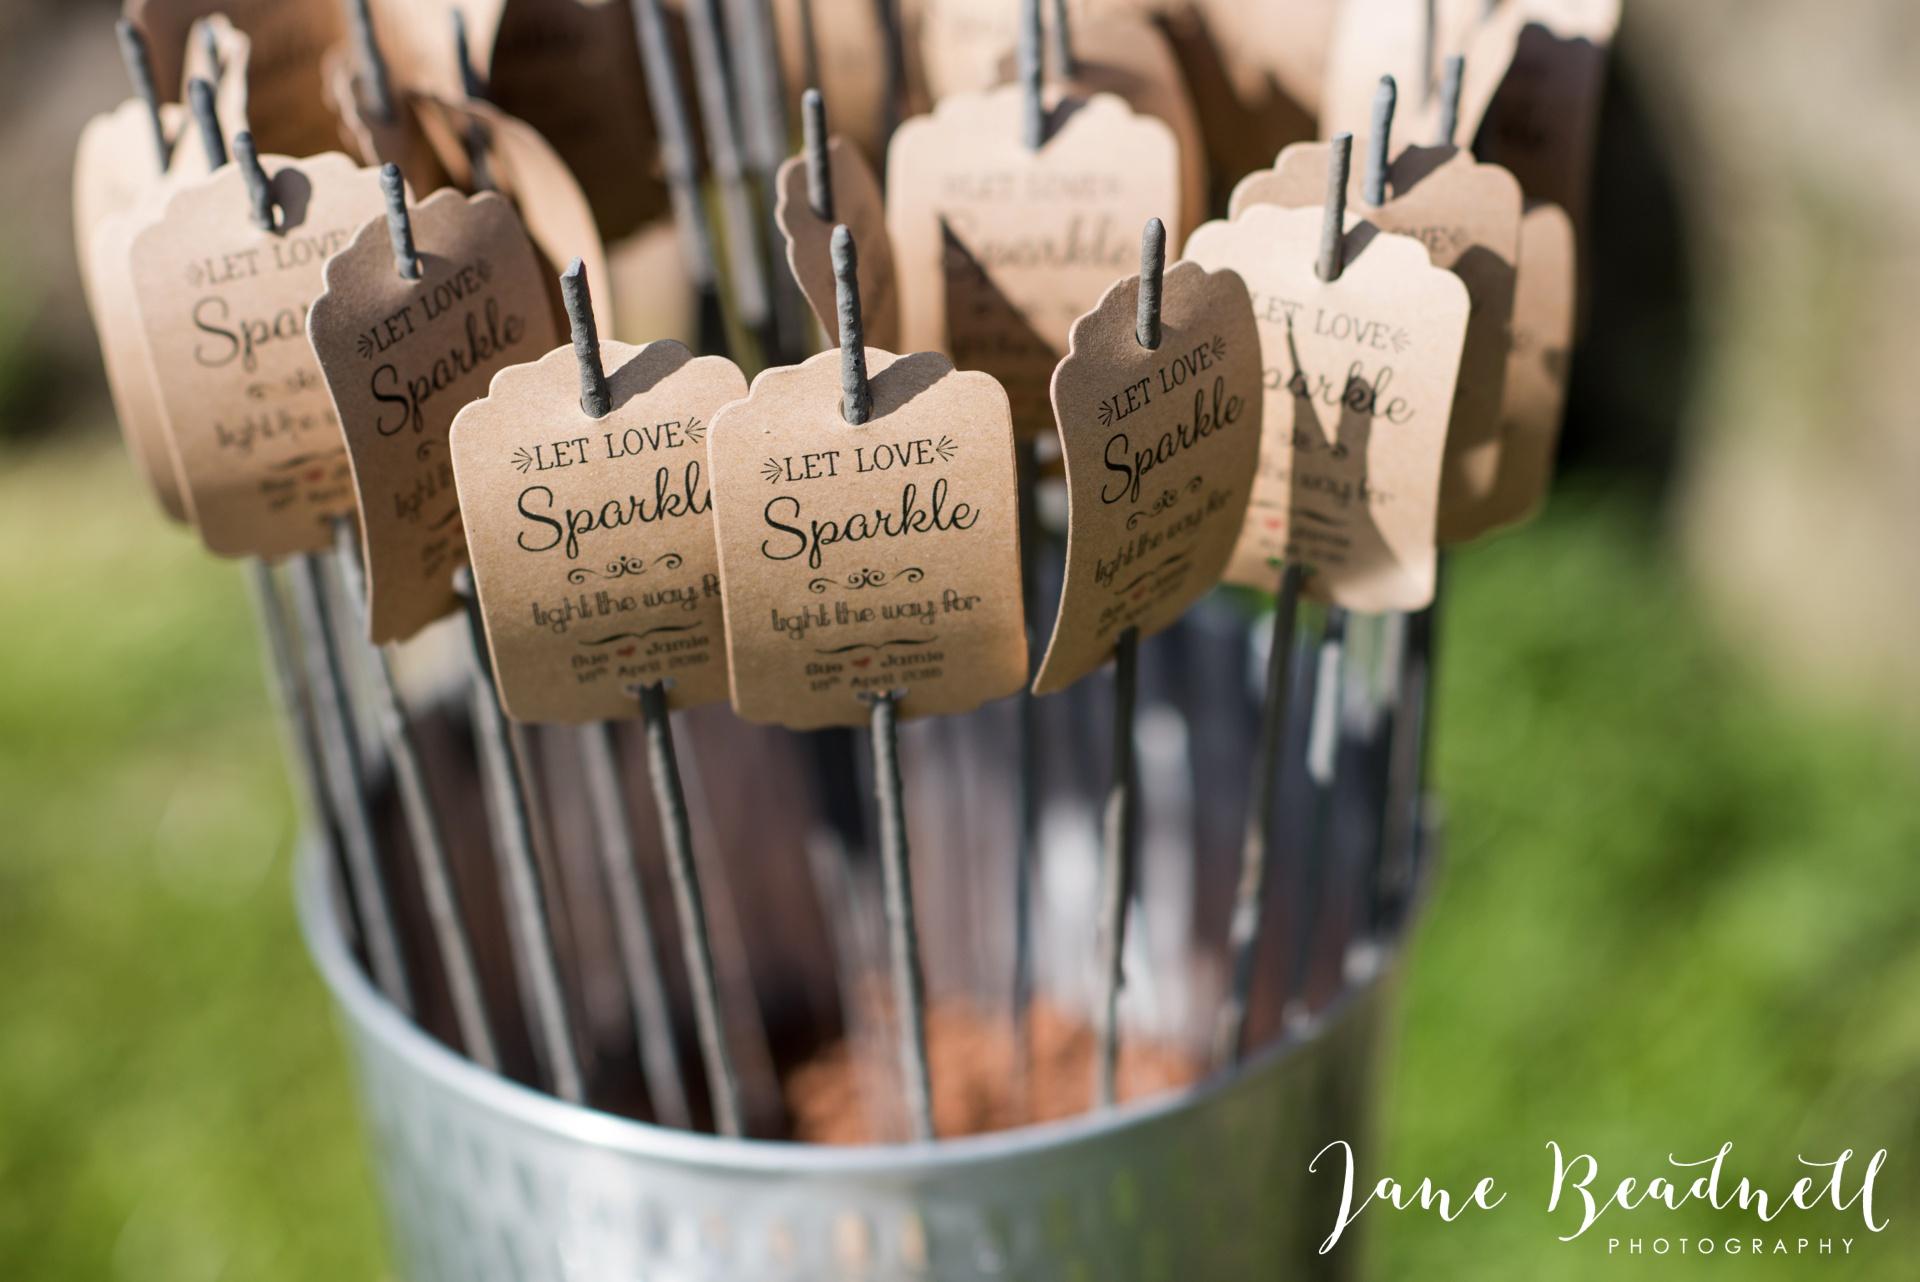 Jane Beadnell fine art wedding photographer The Cheerful Chilli Barn Otley_0008